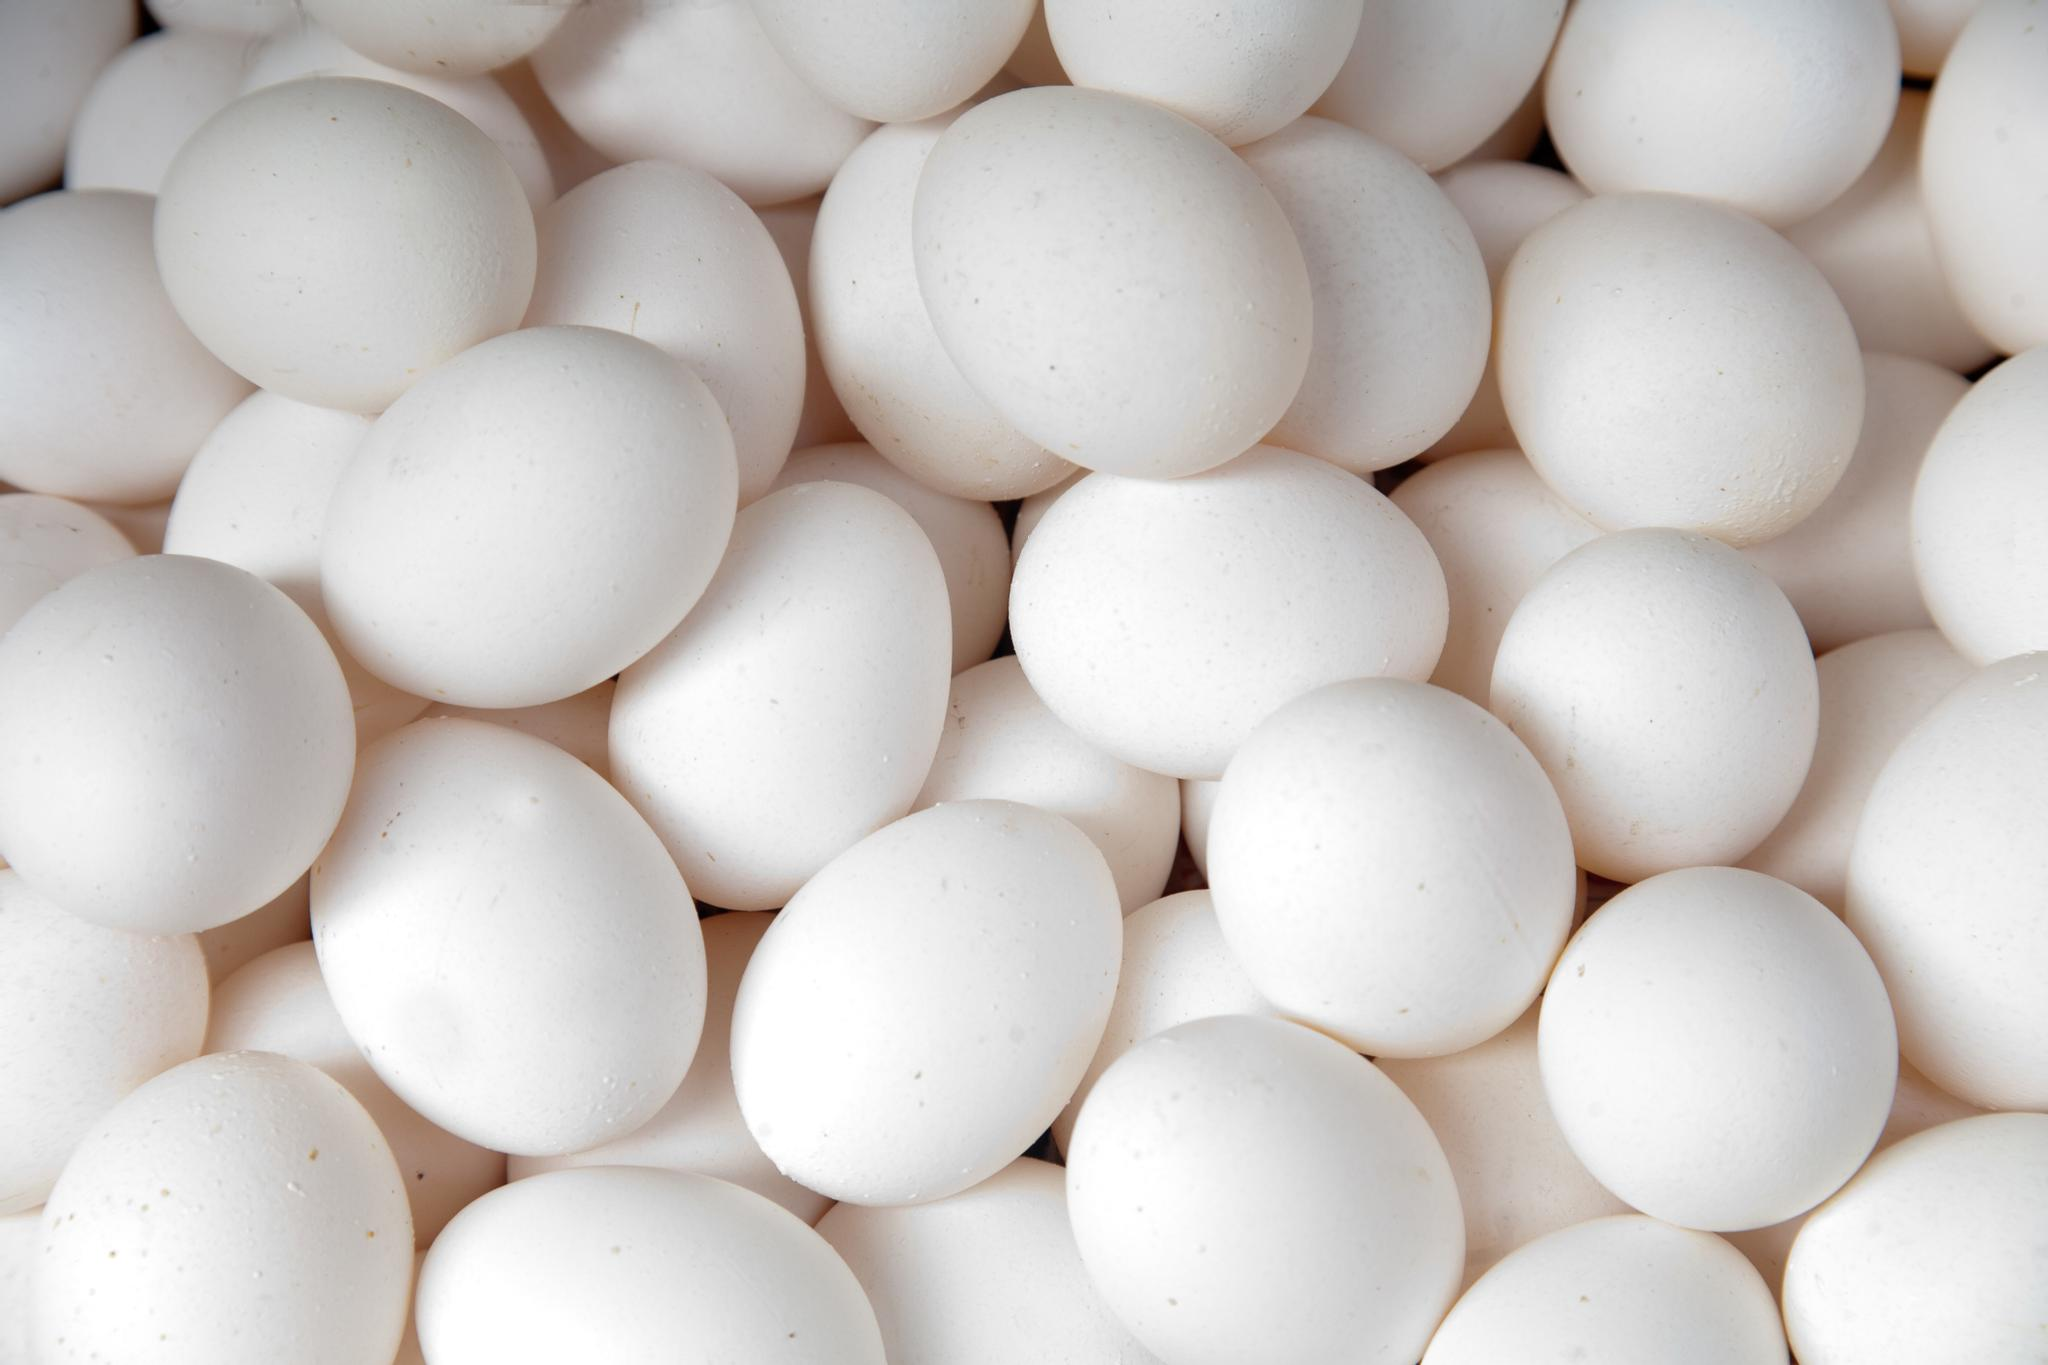 Kananmunan Proteiini